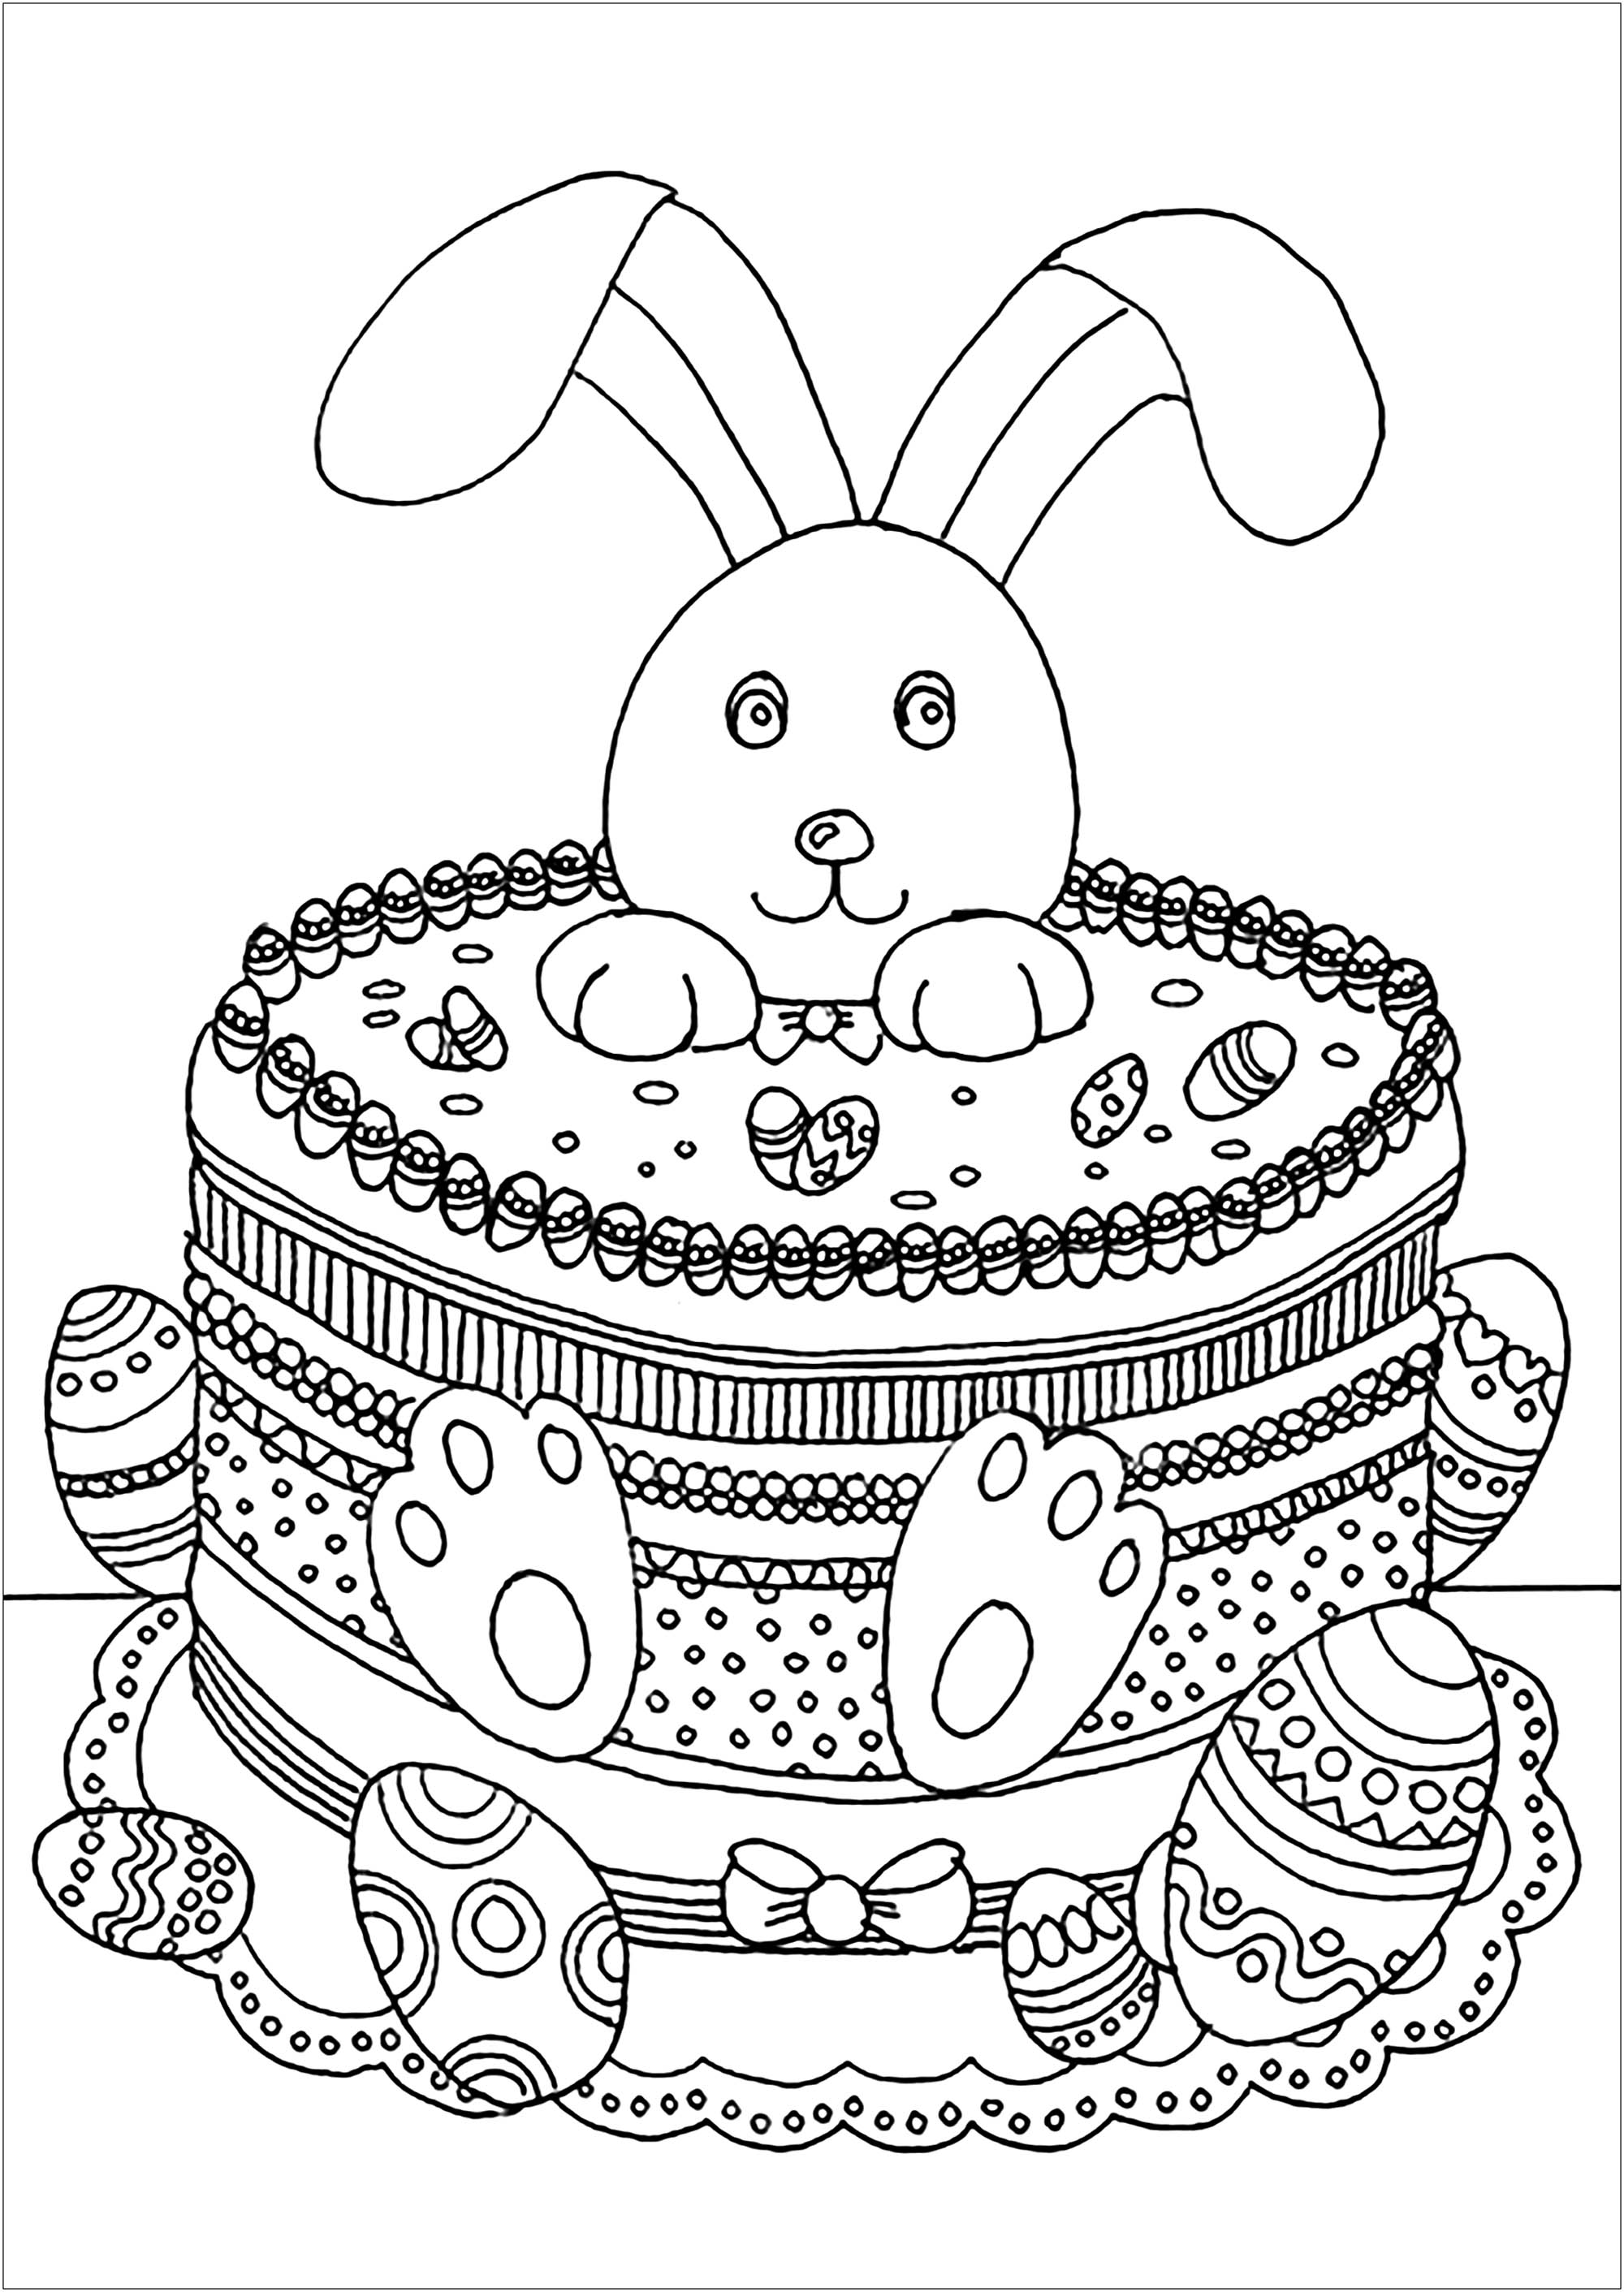 Pascua De Resurreccion 29305 Pascua De Resurrección Colorear